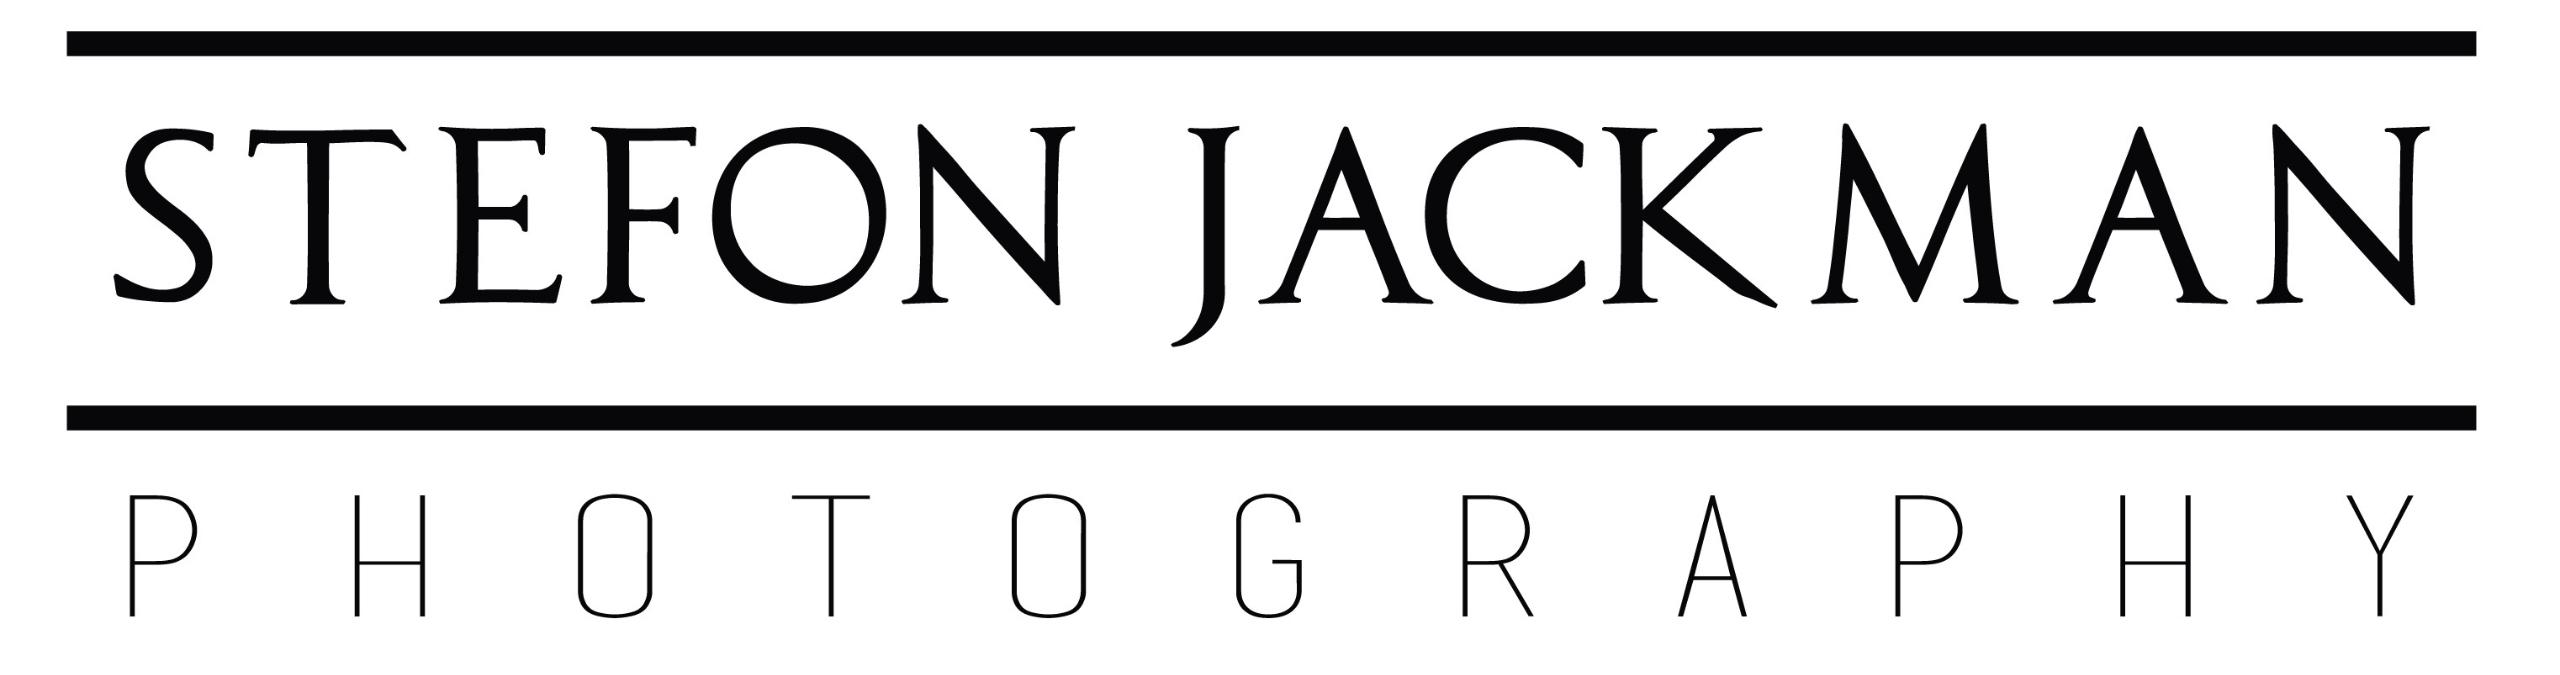 Stefon Jackman (@sjckmn) Cover Image